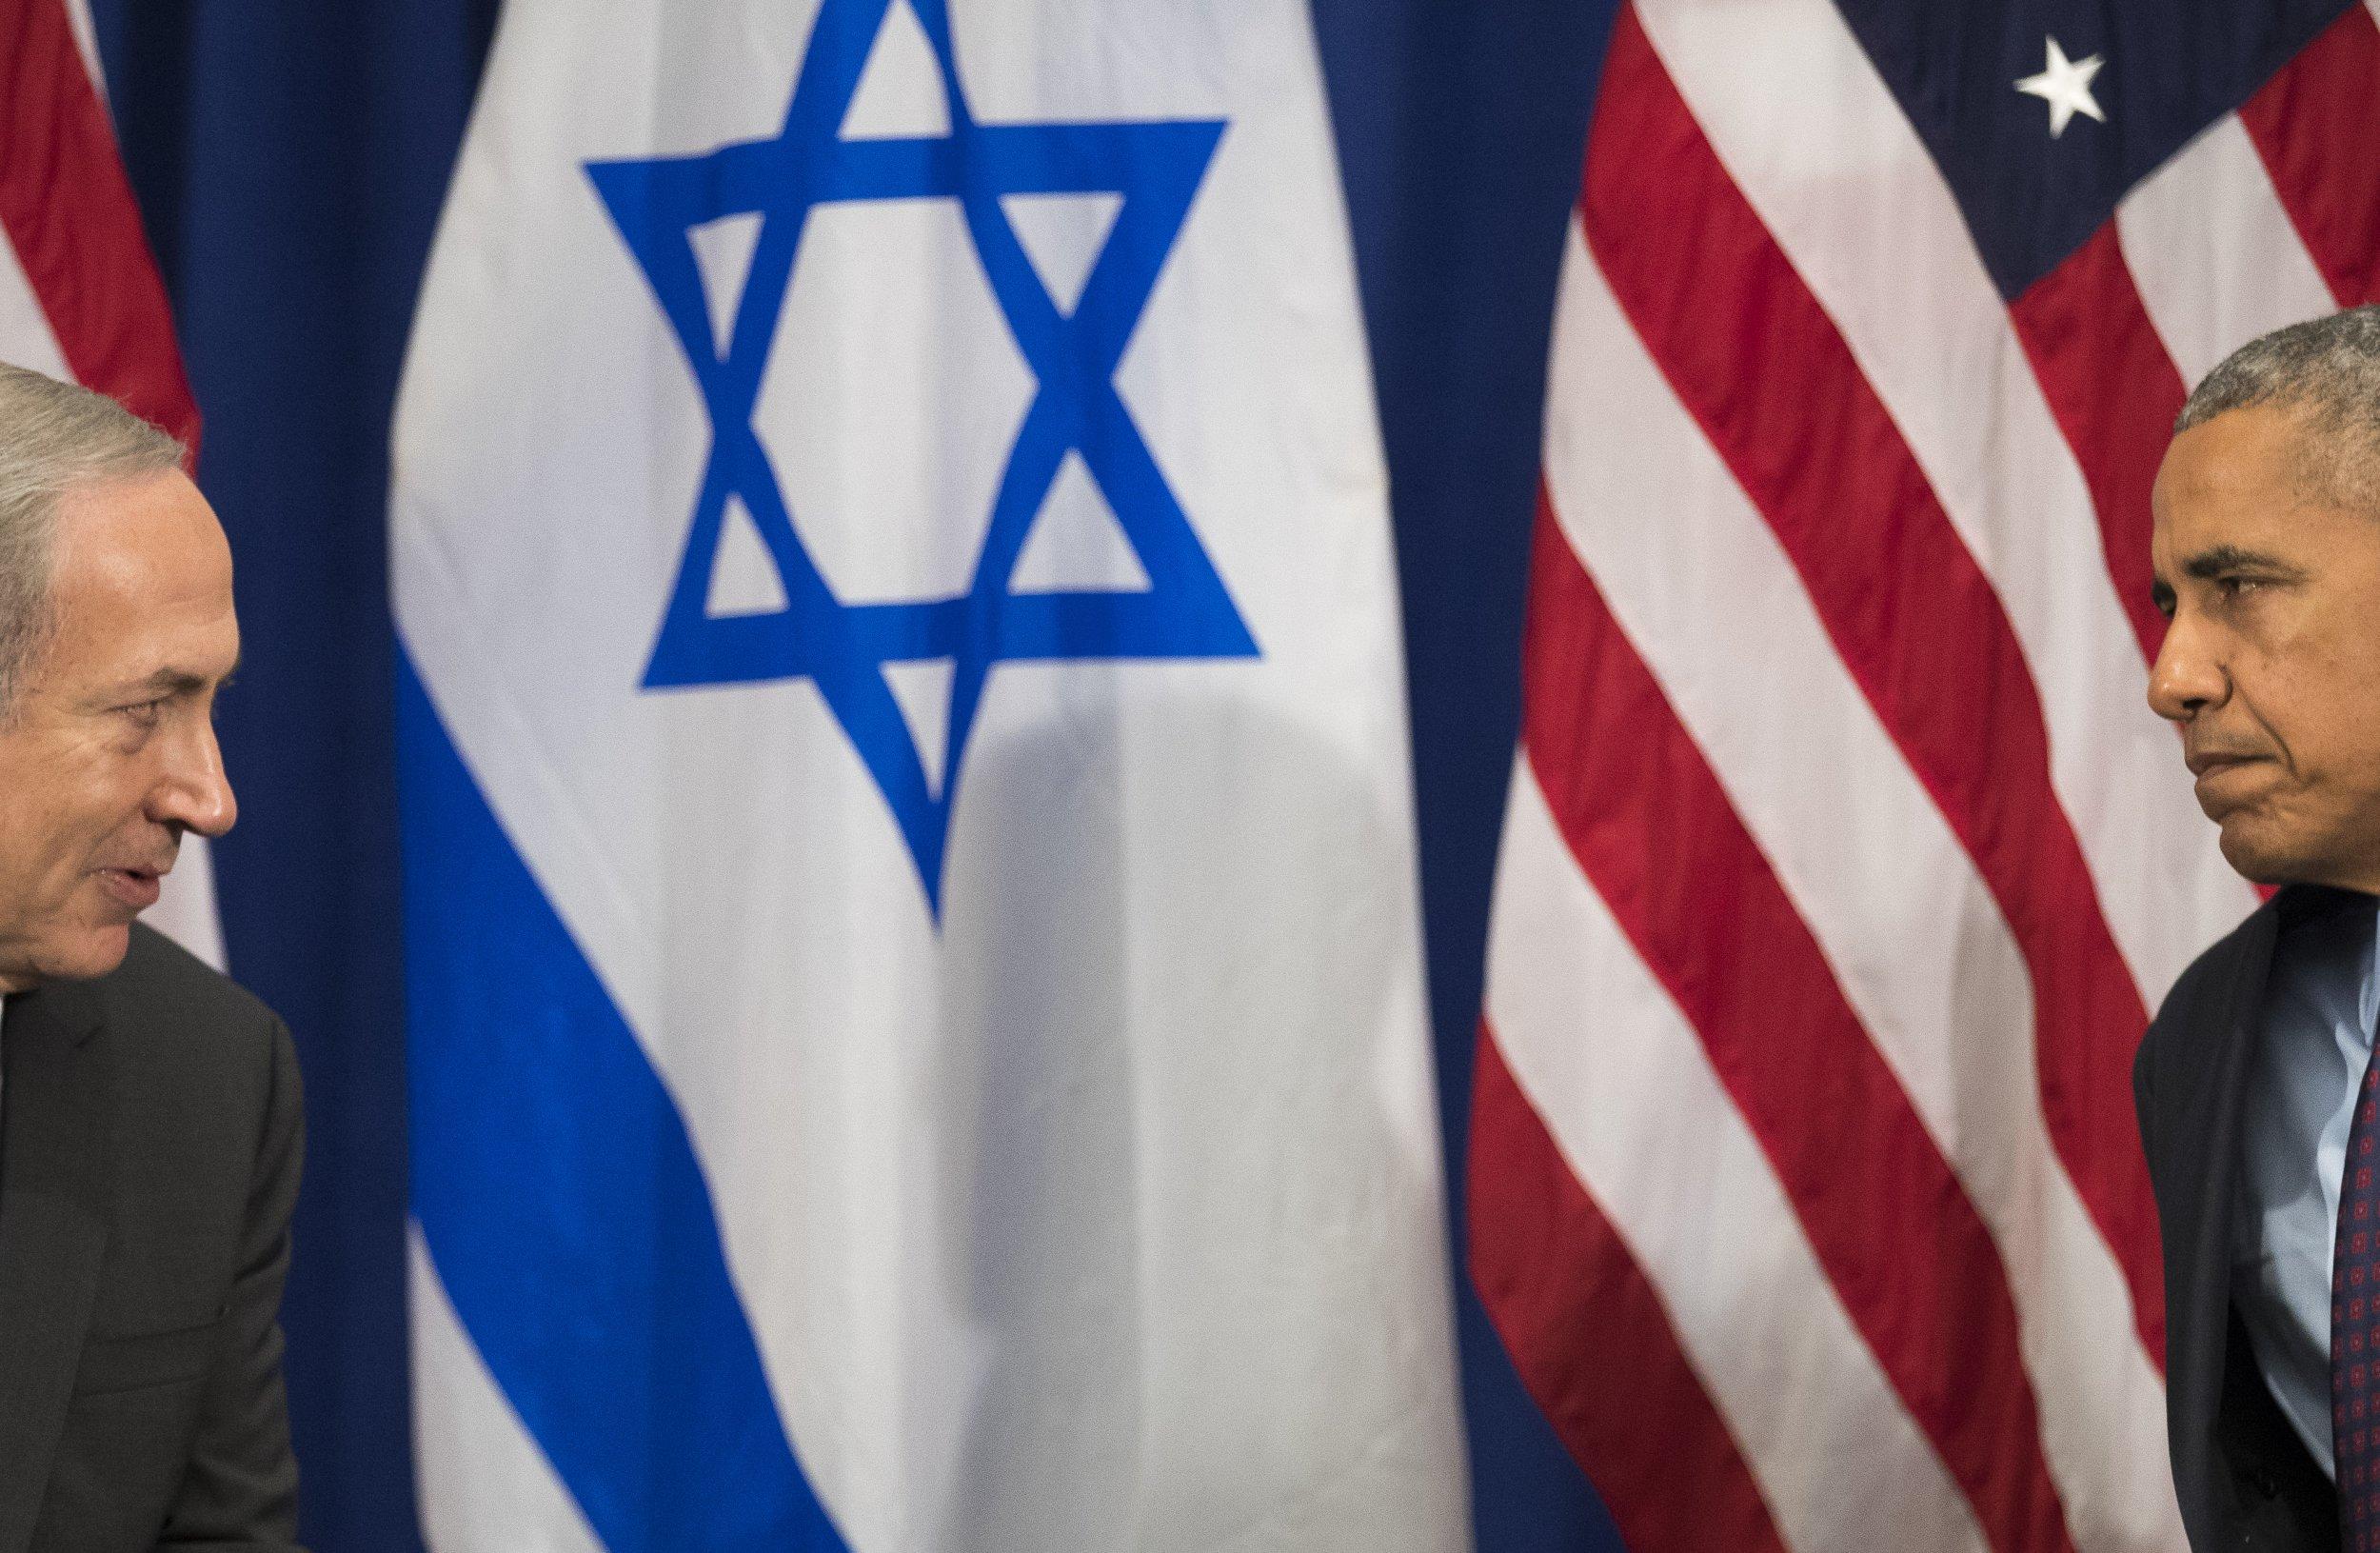 Israeli Prime Minister Benjamin Netanyahu and Barack Obama